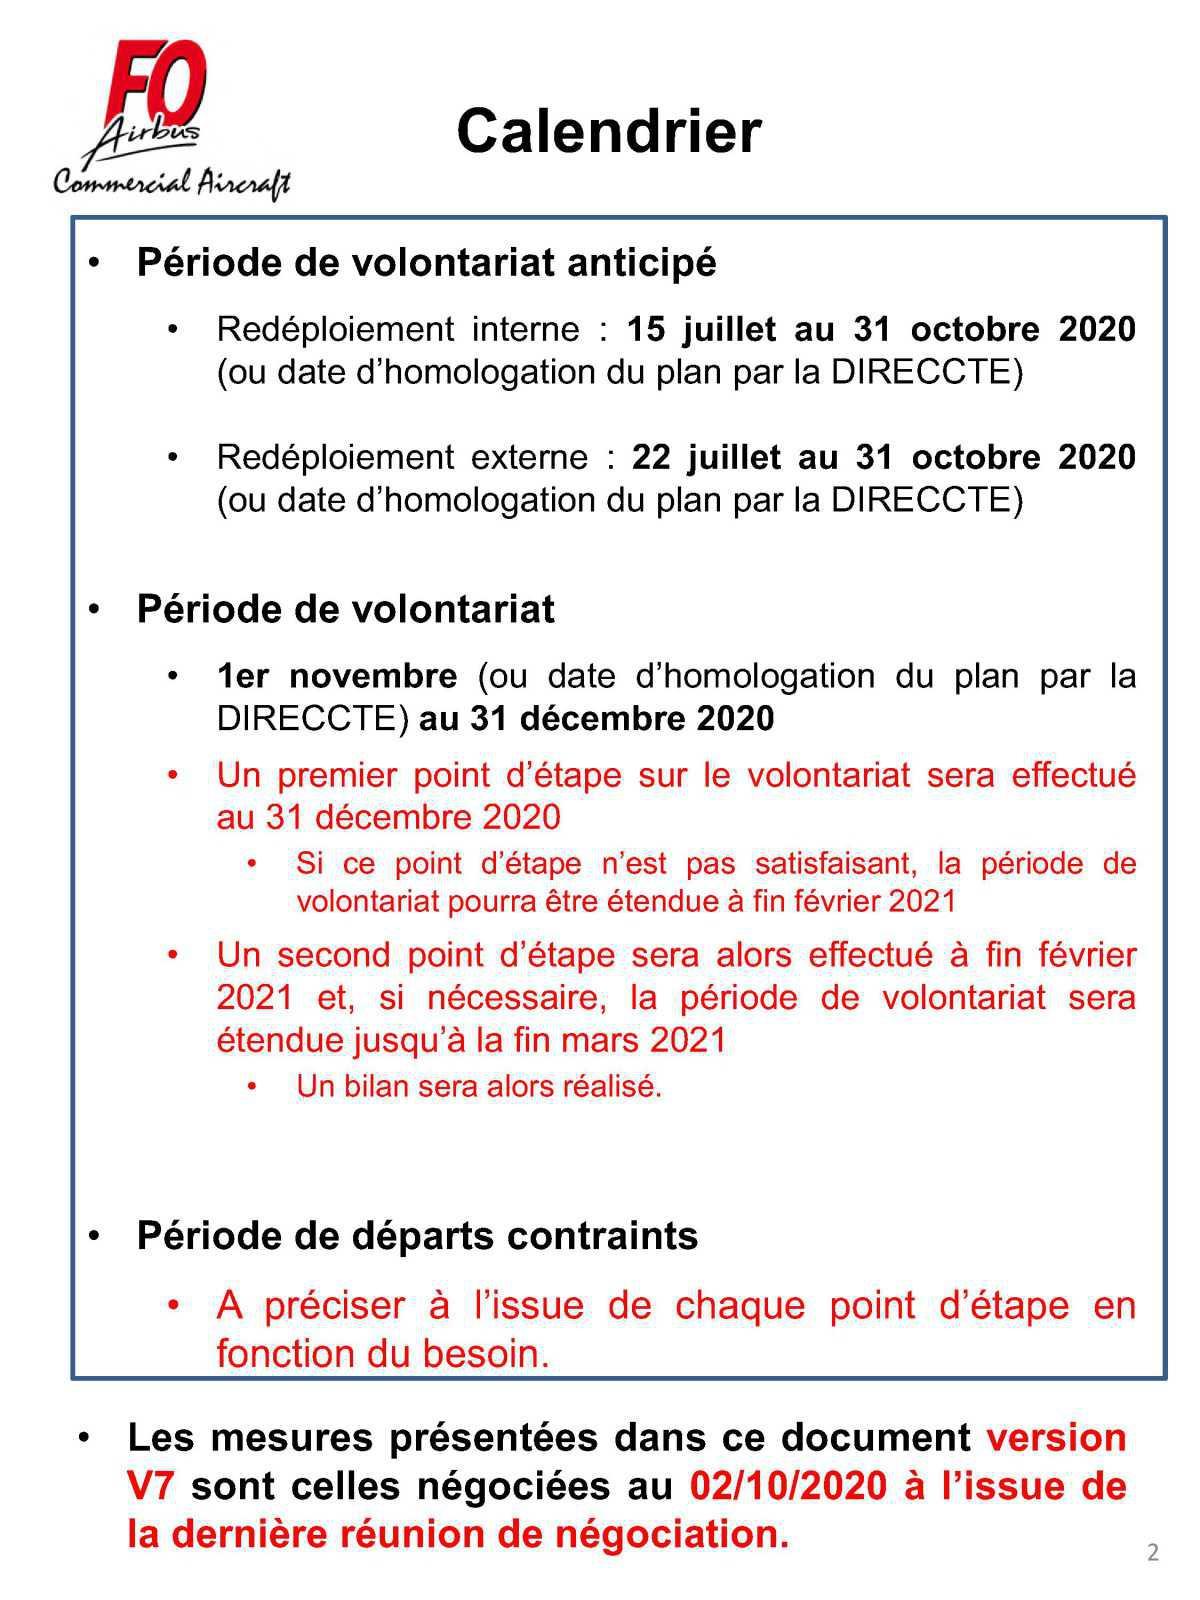 Synthèse sur les mesures sociales ODYSSEY (V7)